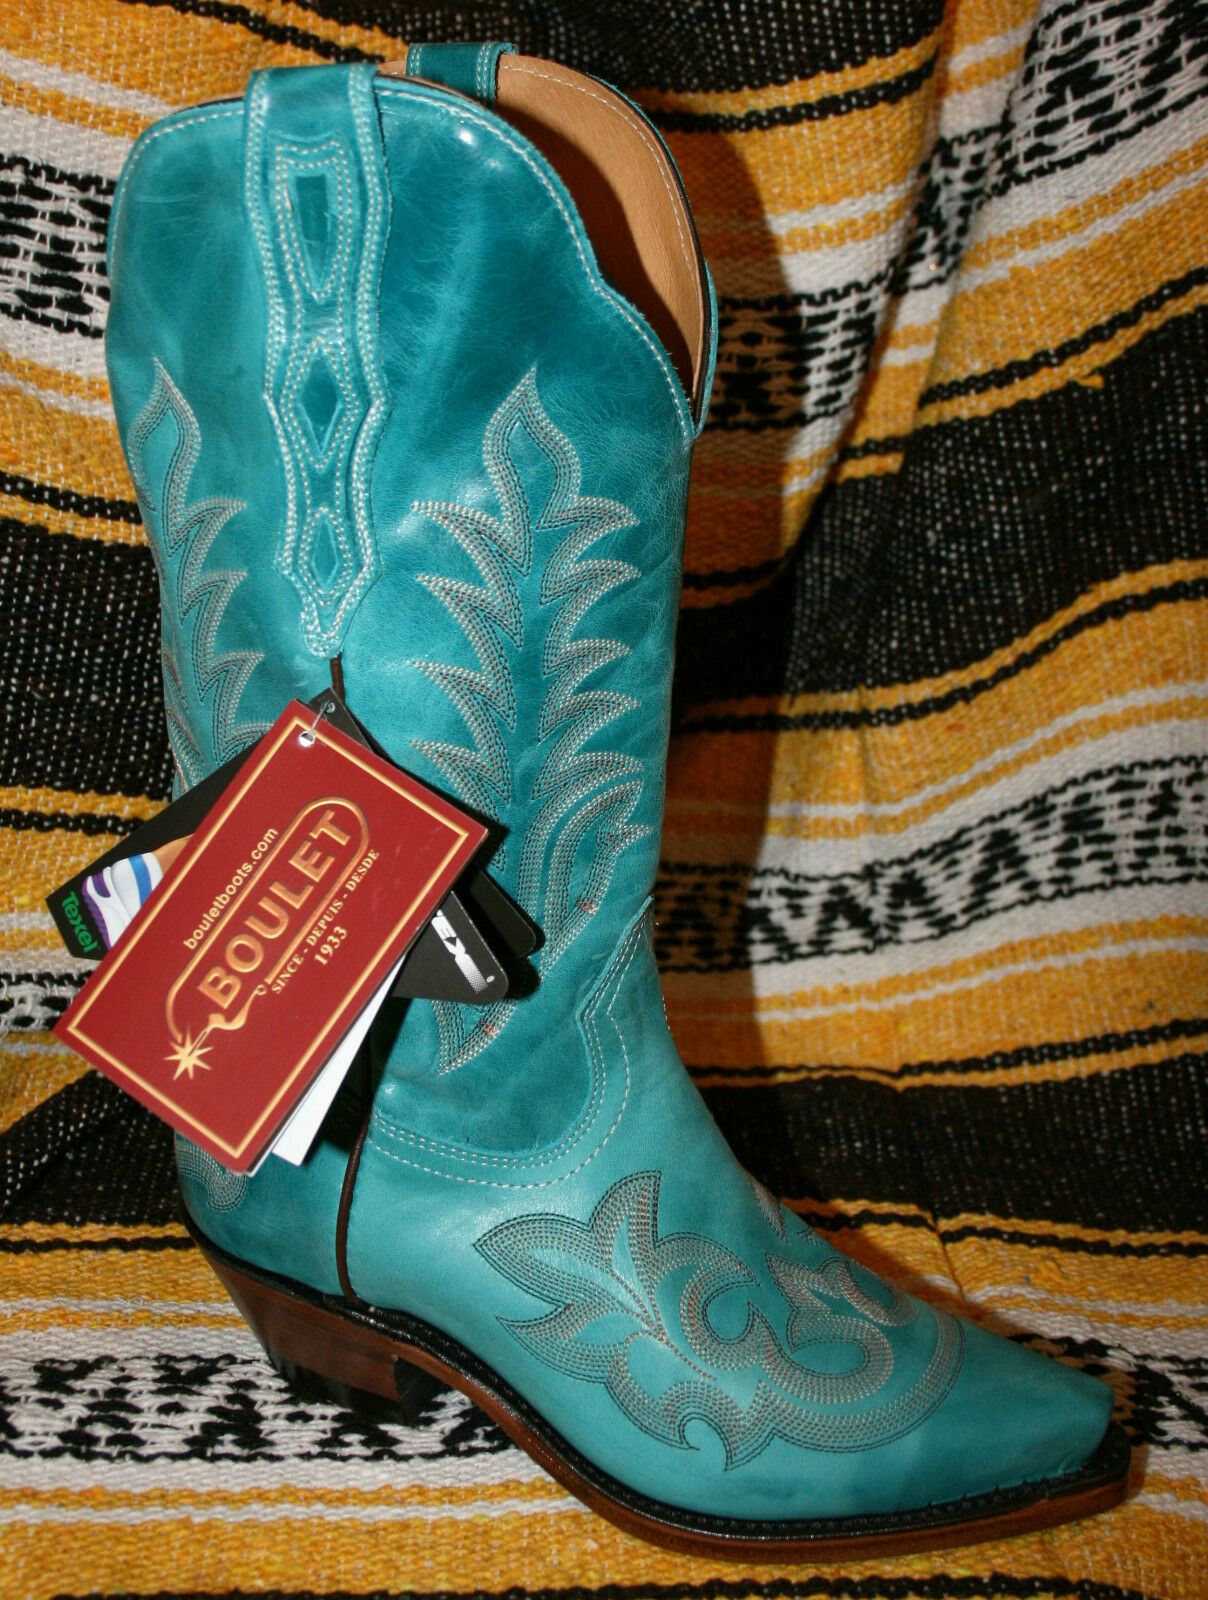 Grandes zapatos con descuento Boots Boulet 3635 bleu turquoise made in CANADA